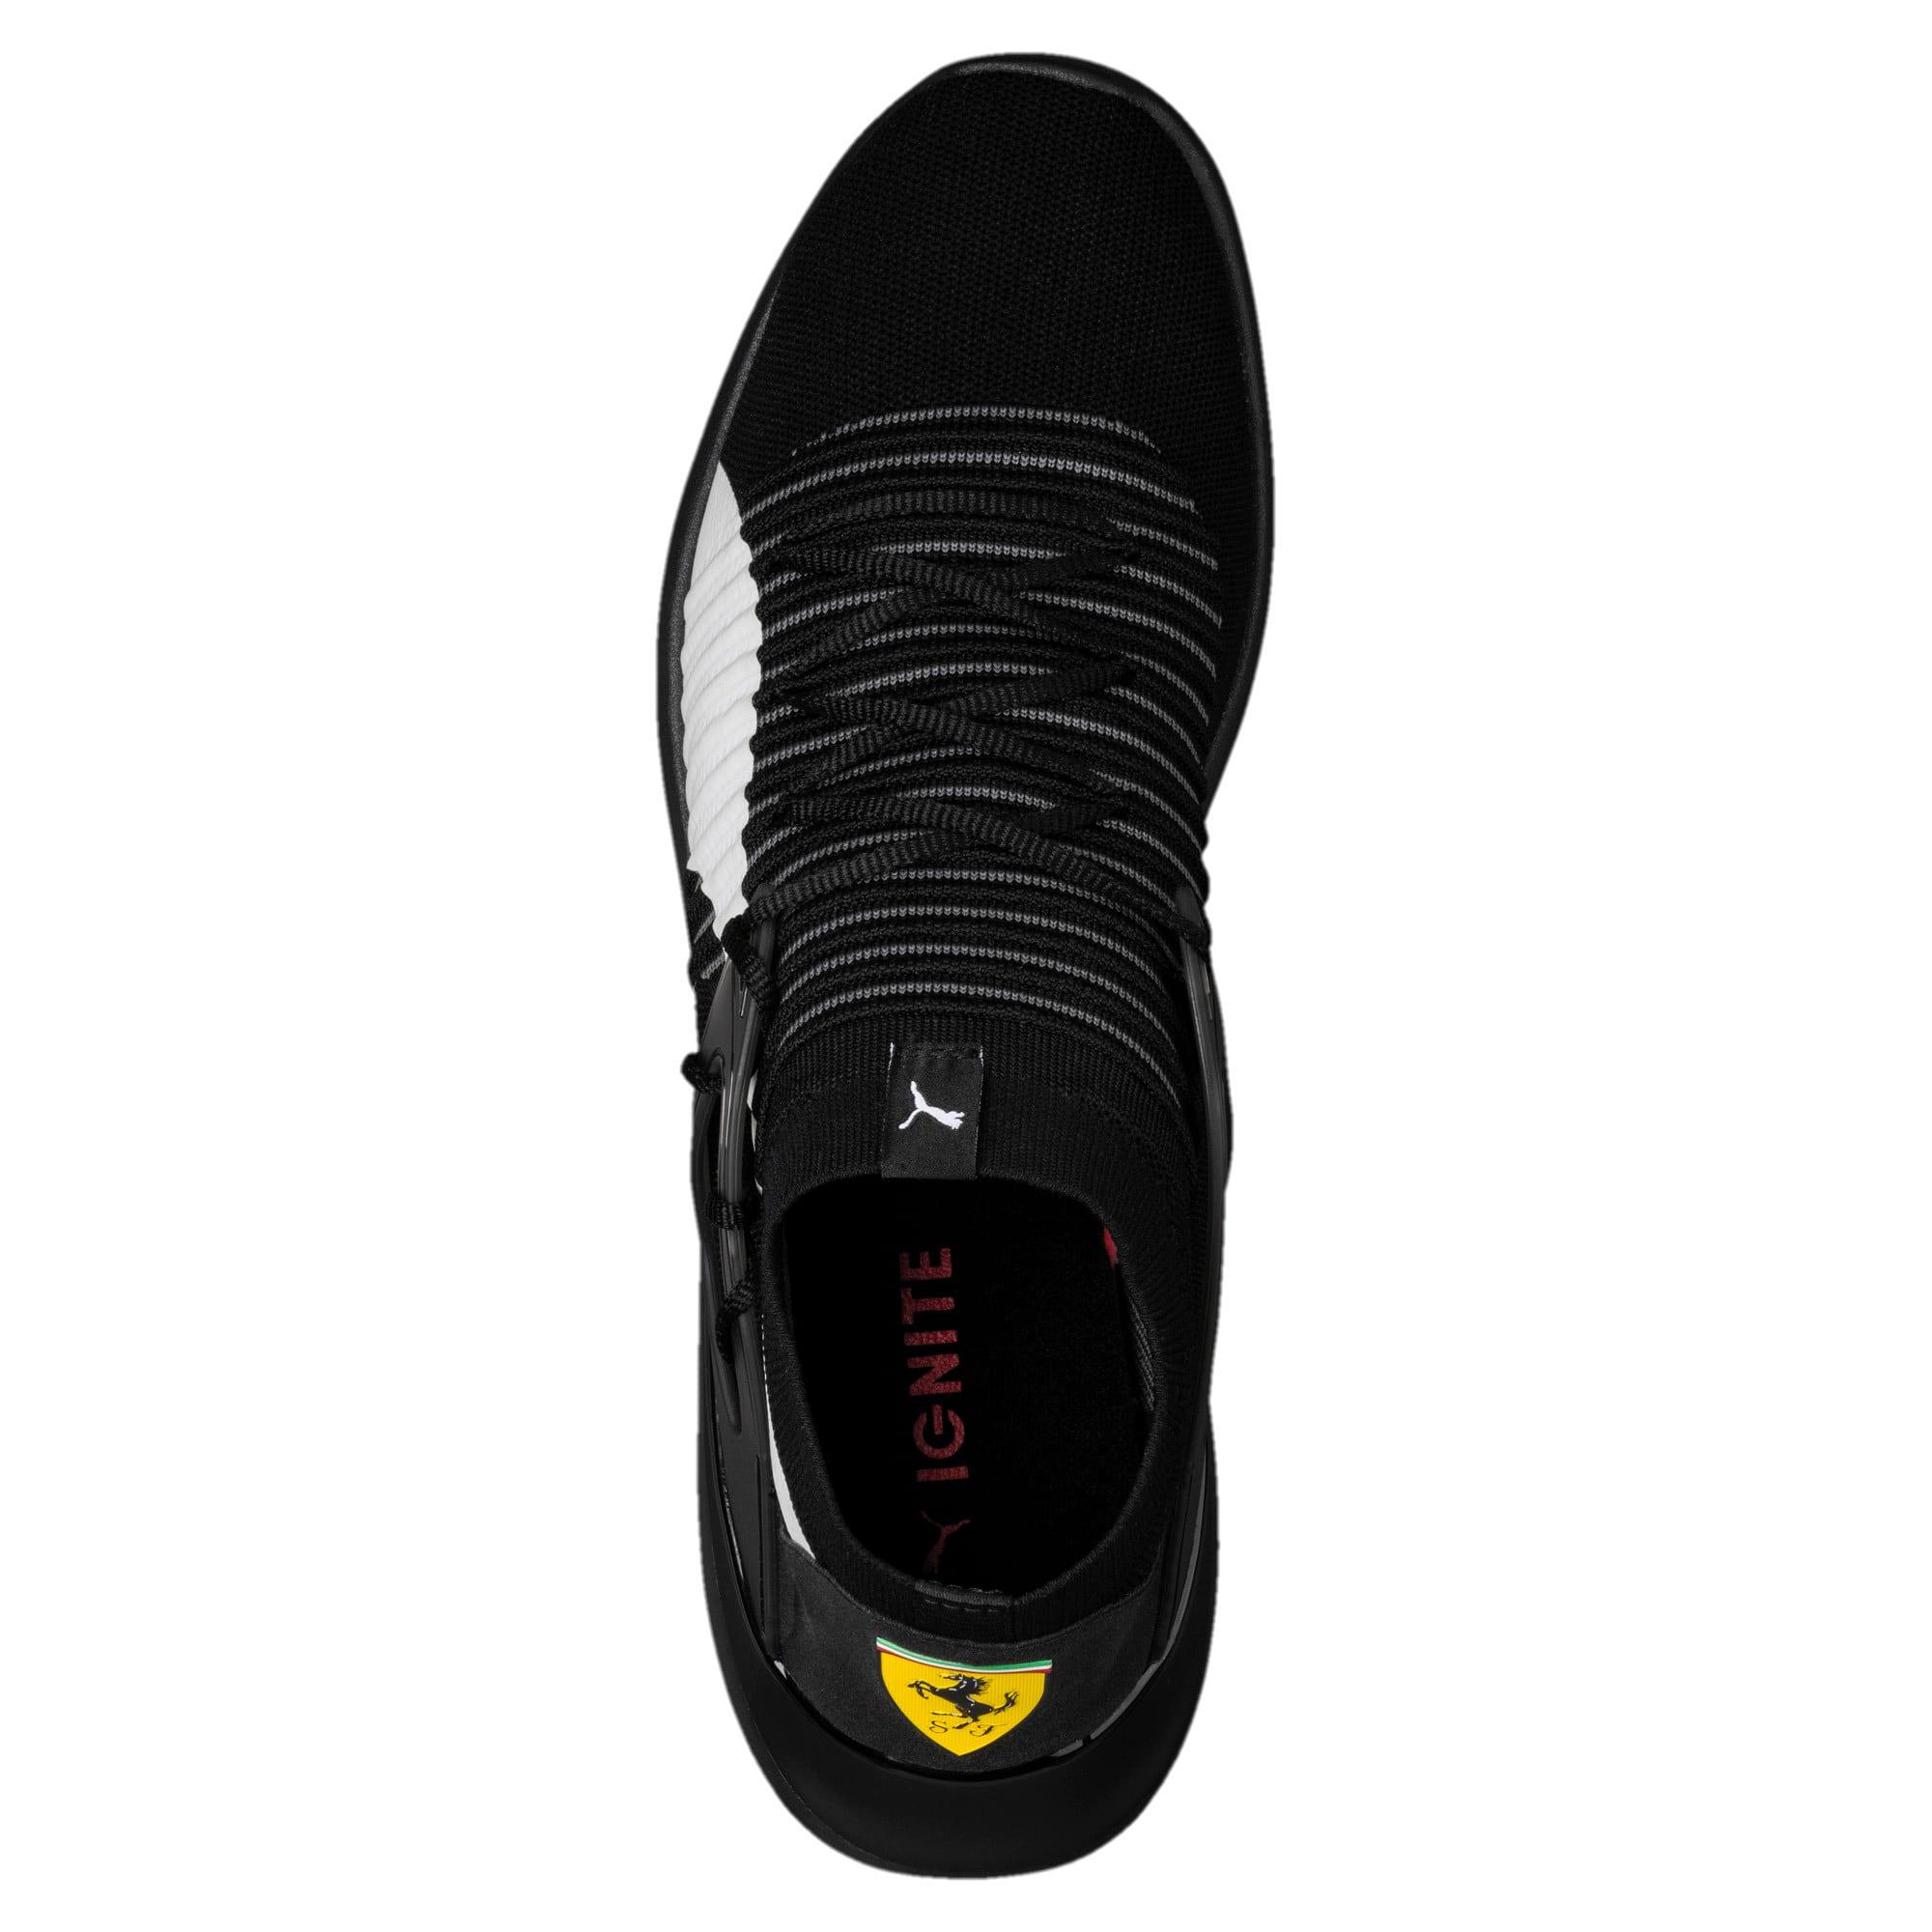 Thumbnail 5 of Ferrari Evo Cat Sock Lace Trainers, Puma Black-Puma White-Black, medium-IND